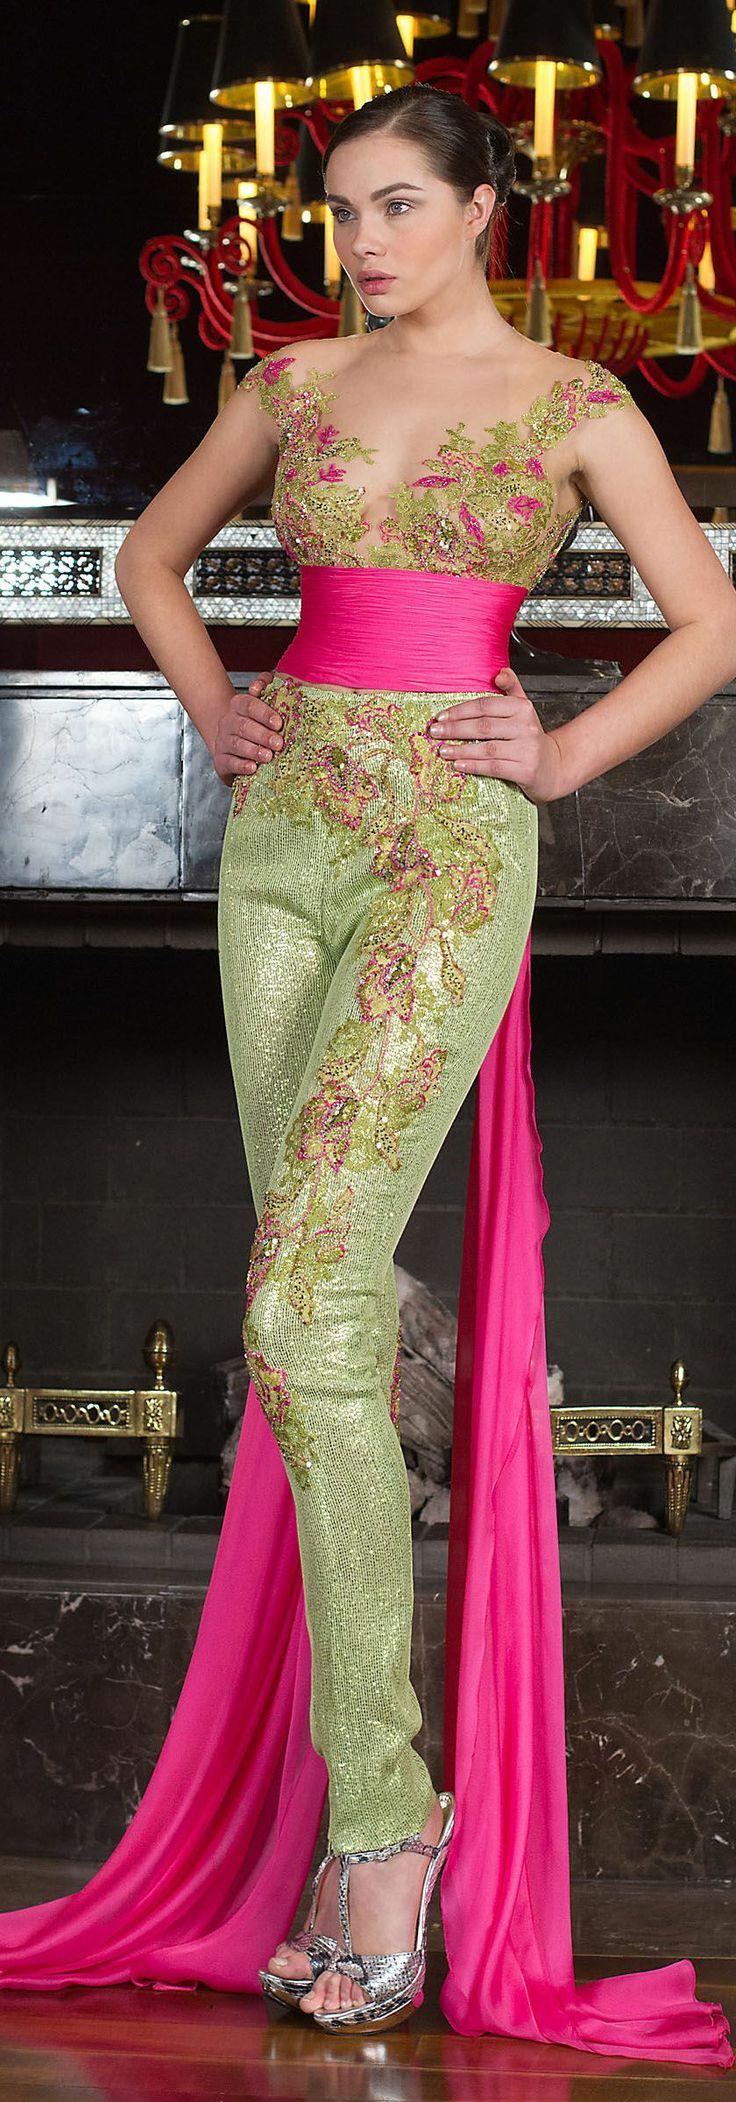 Toufiq Hatab Spring-Summer 2014 Couture- ♔LadyLuxury♔